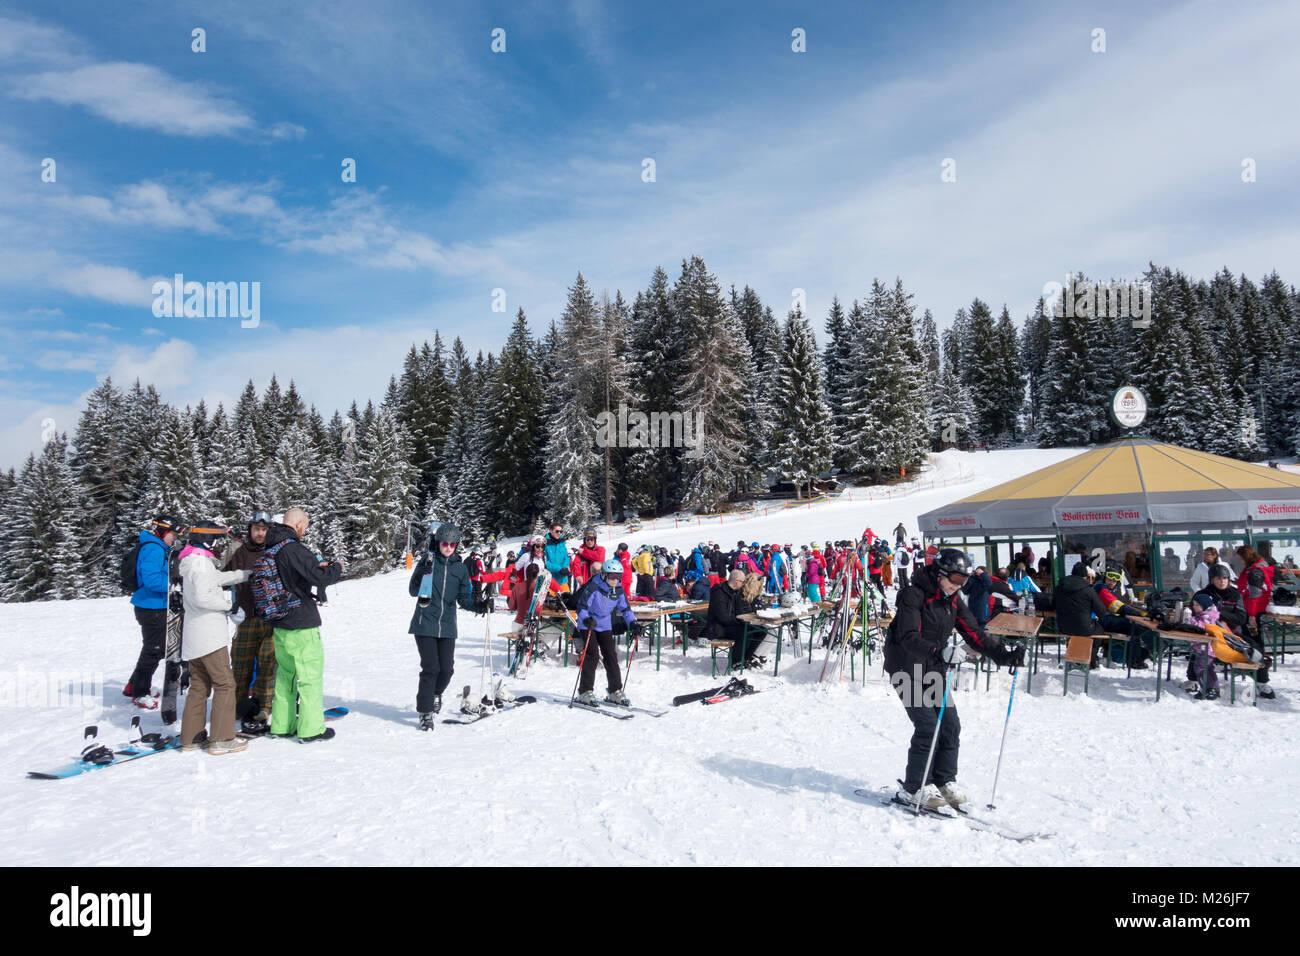 Skiers at a ski cafe on the ski slopes or pistes above Niederau, Alpbach, Tirol, Austria Europe - Stock Image